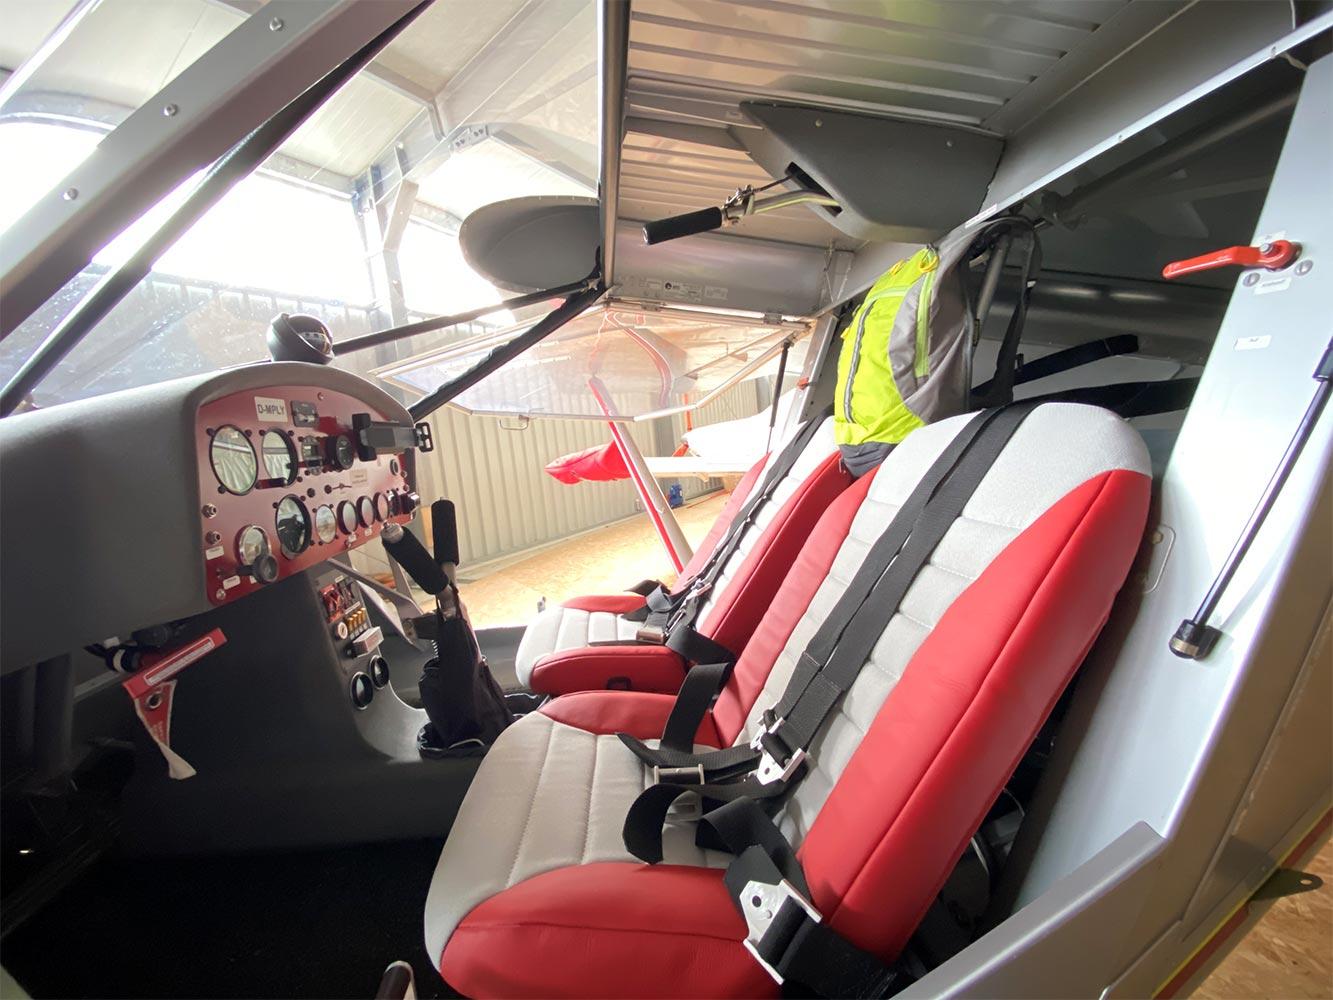 Cockpit des Ultraleichtflugzeuges Rundflug Bayern